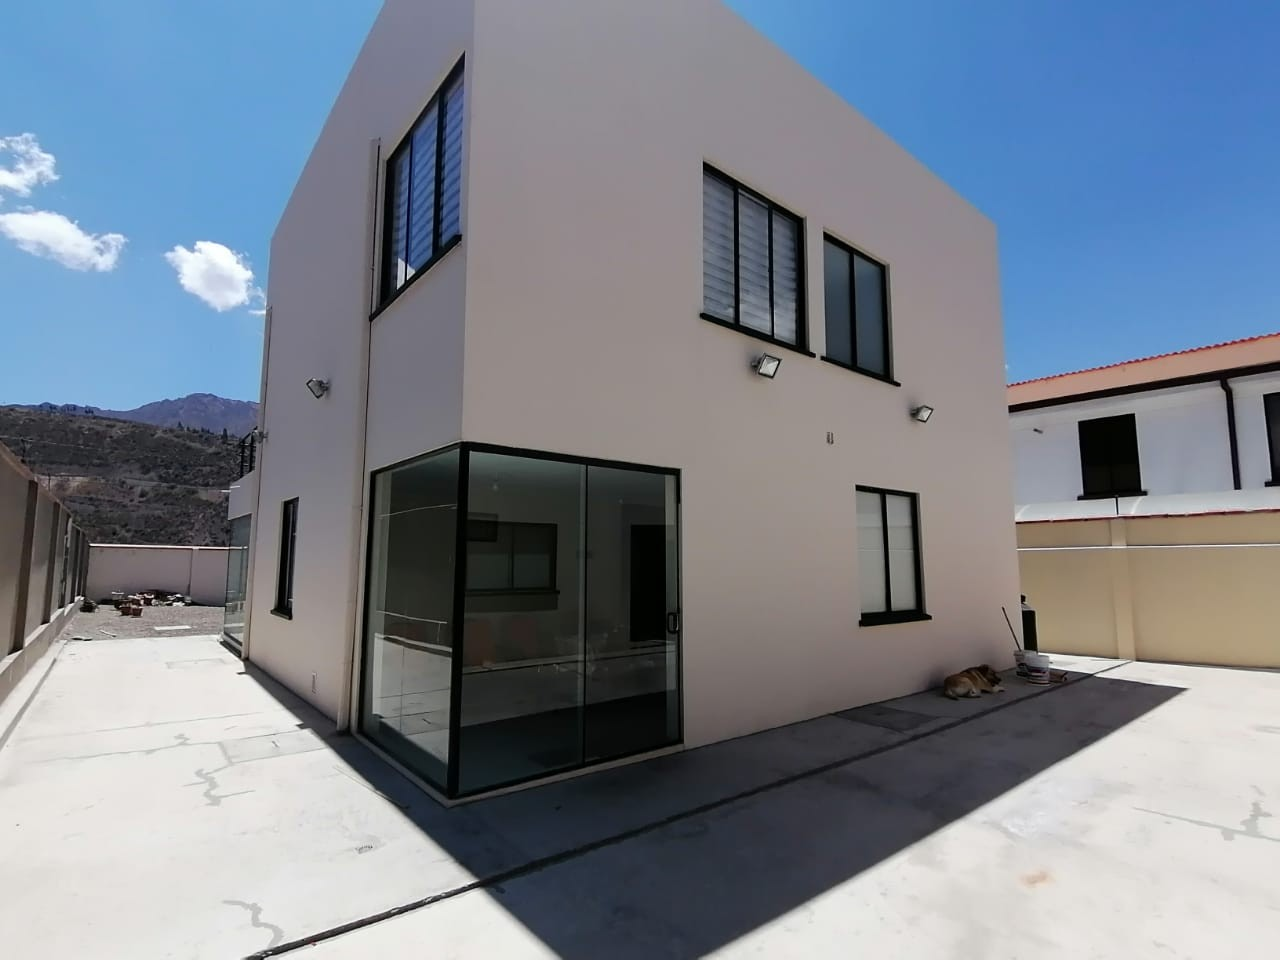 Casa en Venta $us.250.000.- LINDA CASA EN VENTA JUPAPINA 653 mtrs DE TERRENO LPZ Foto 17